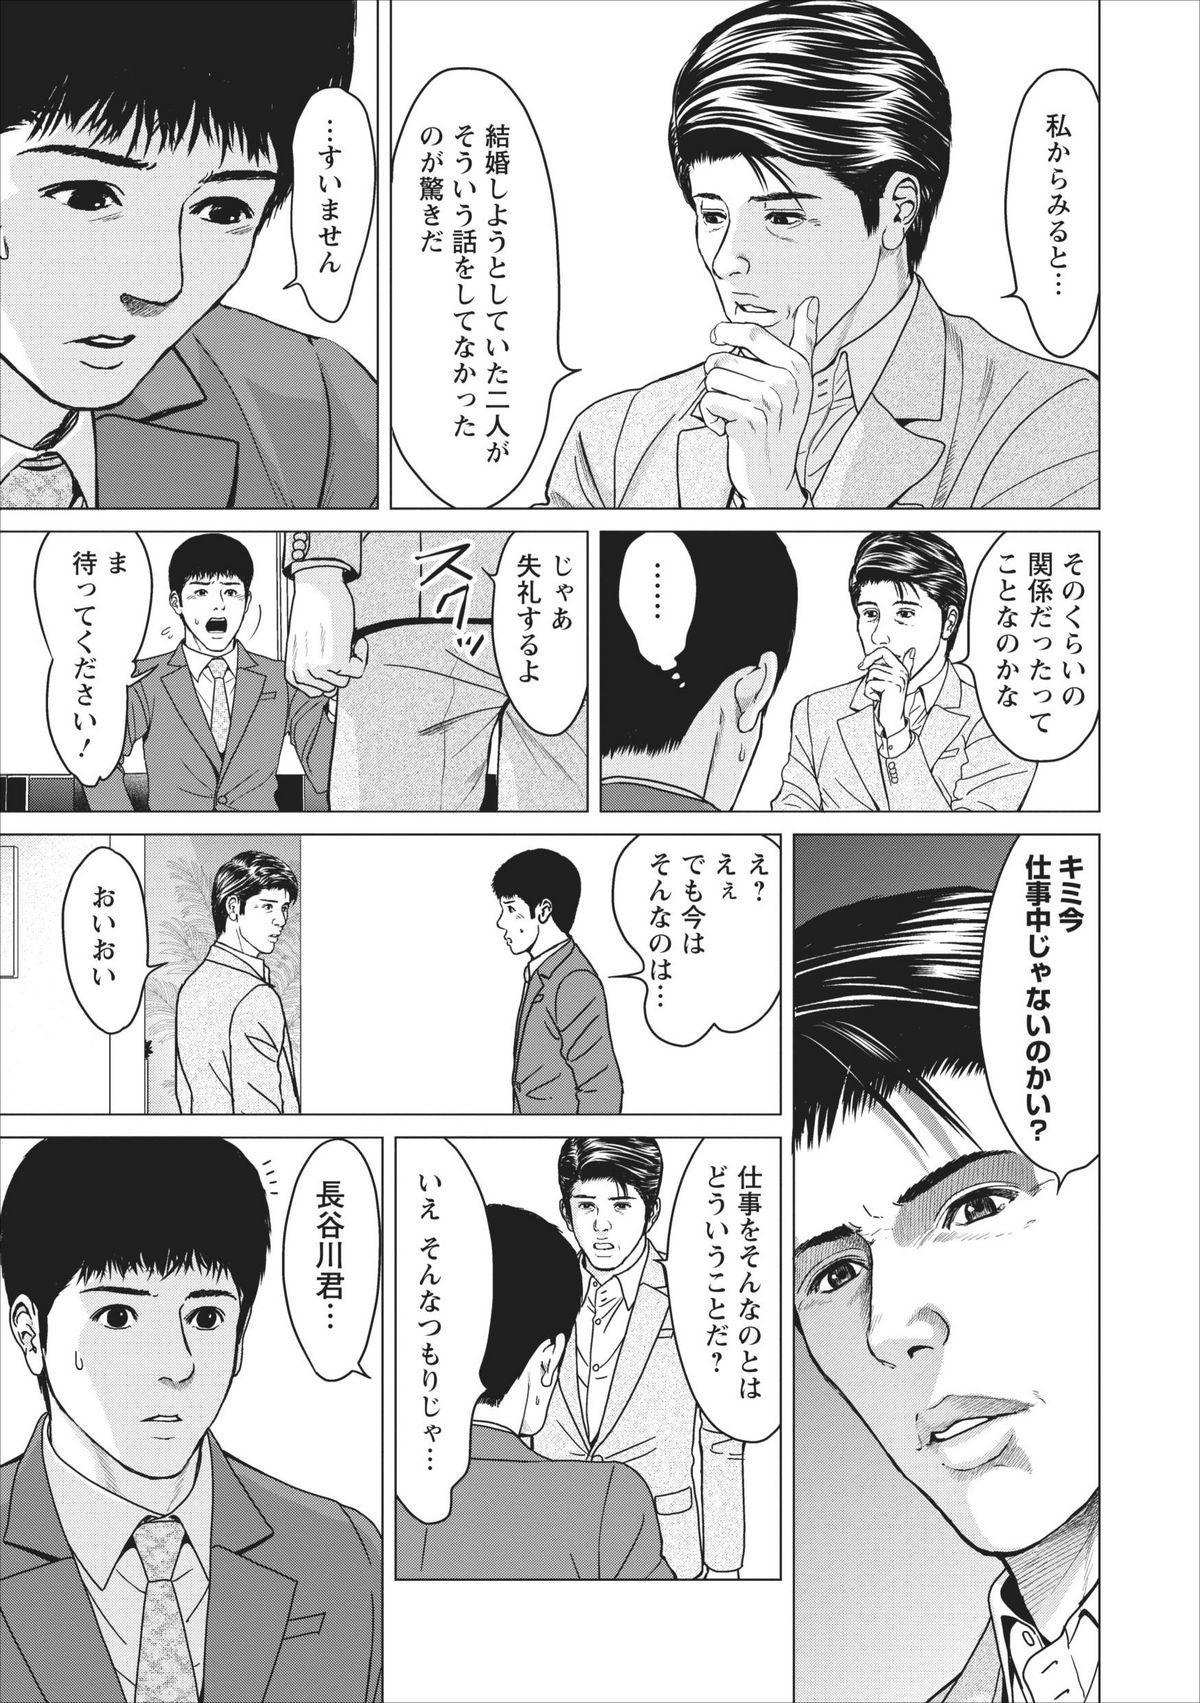 Sex Izonshou ch.9 4